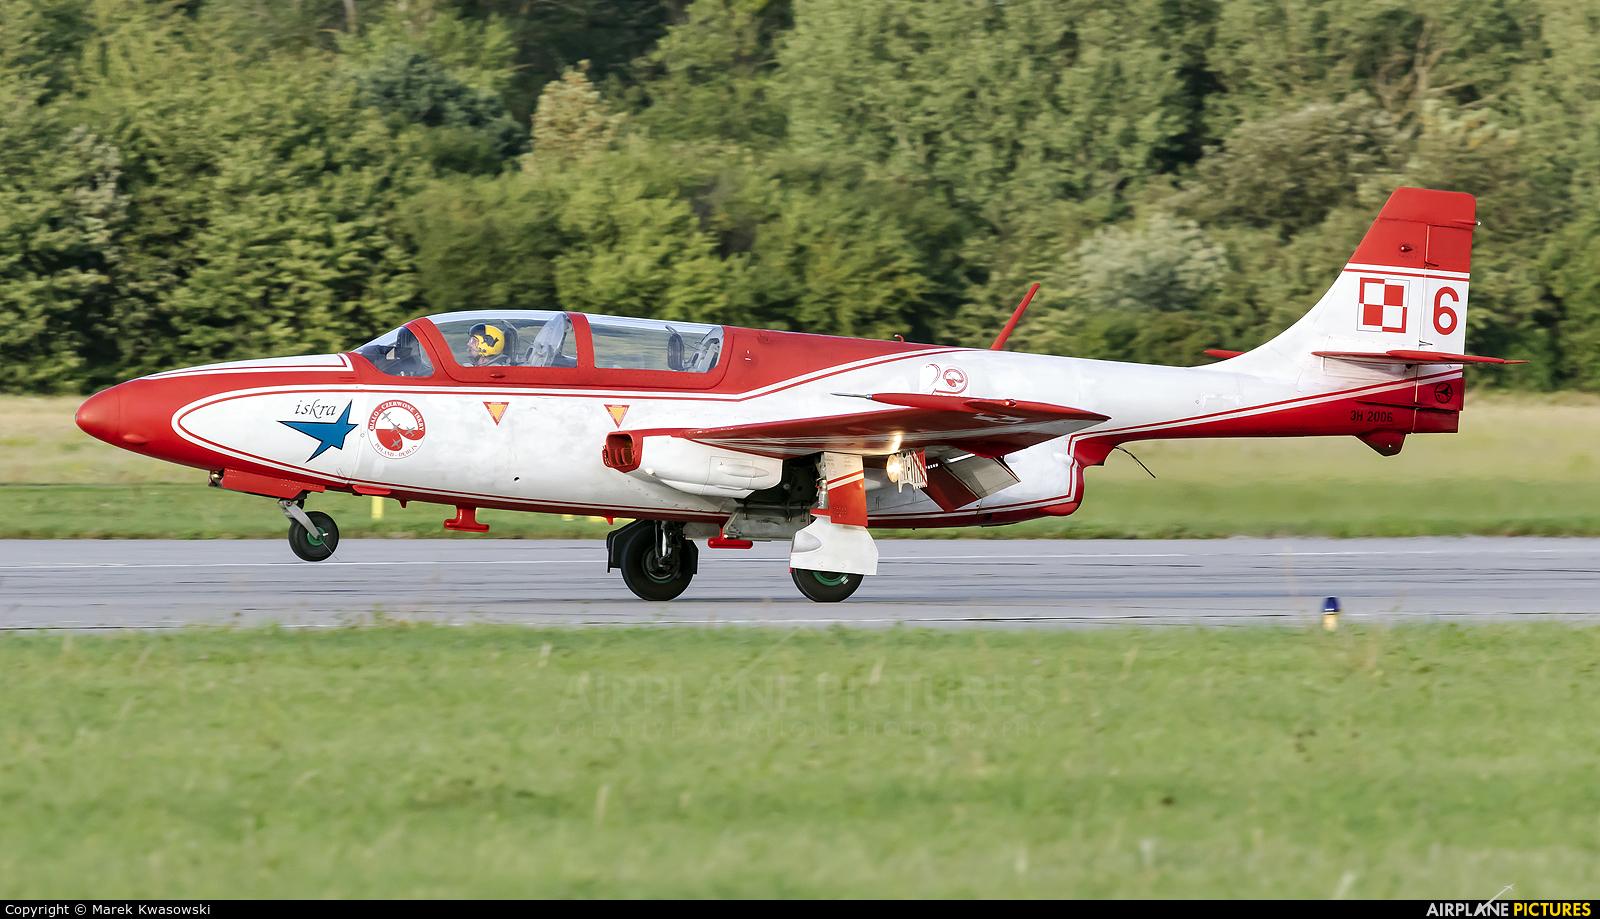 Poland - Air Force: White & Red Iskras 6 aircraft at Gdynia- Babie Doły (Oksywie)